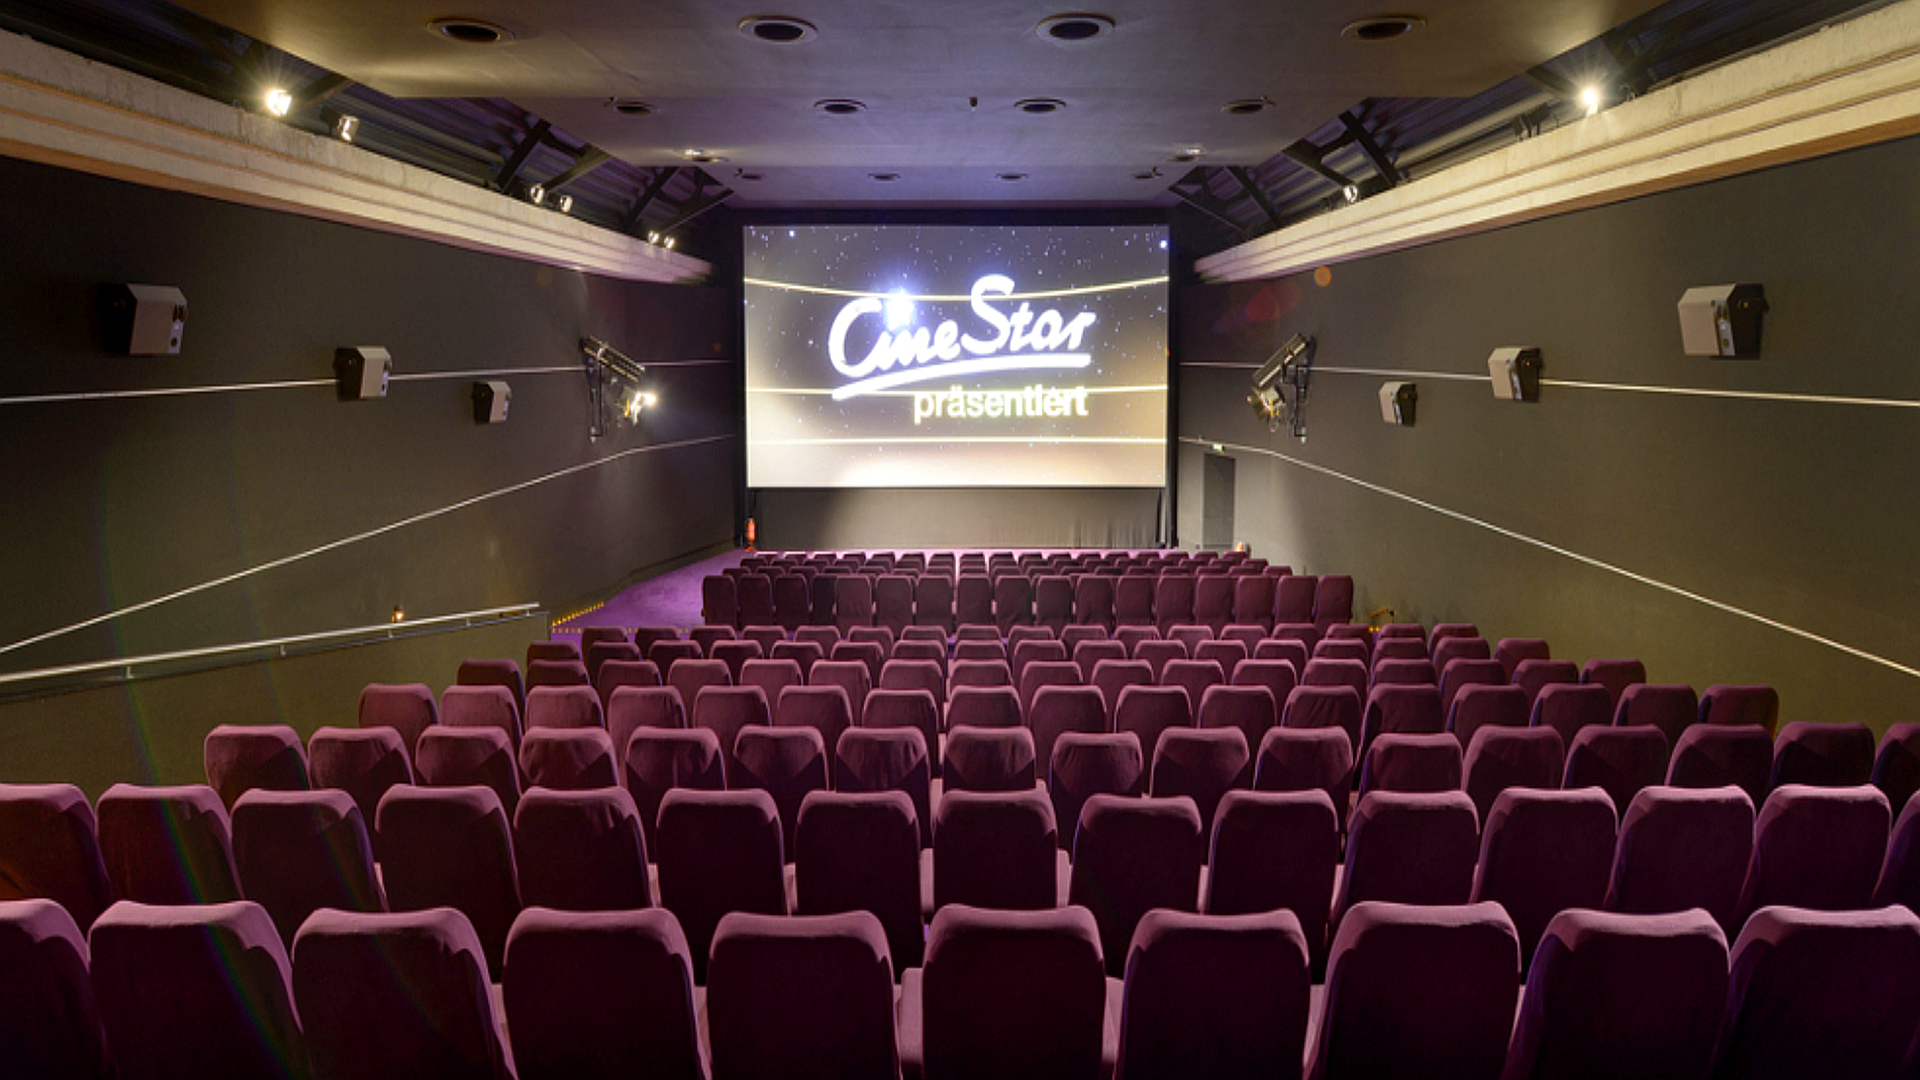 Cinestar Offenbach